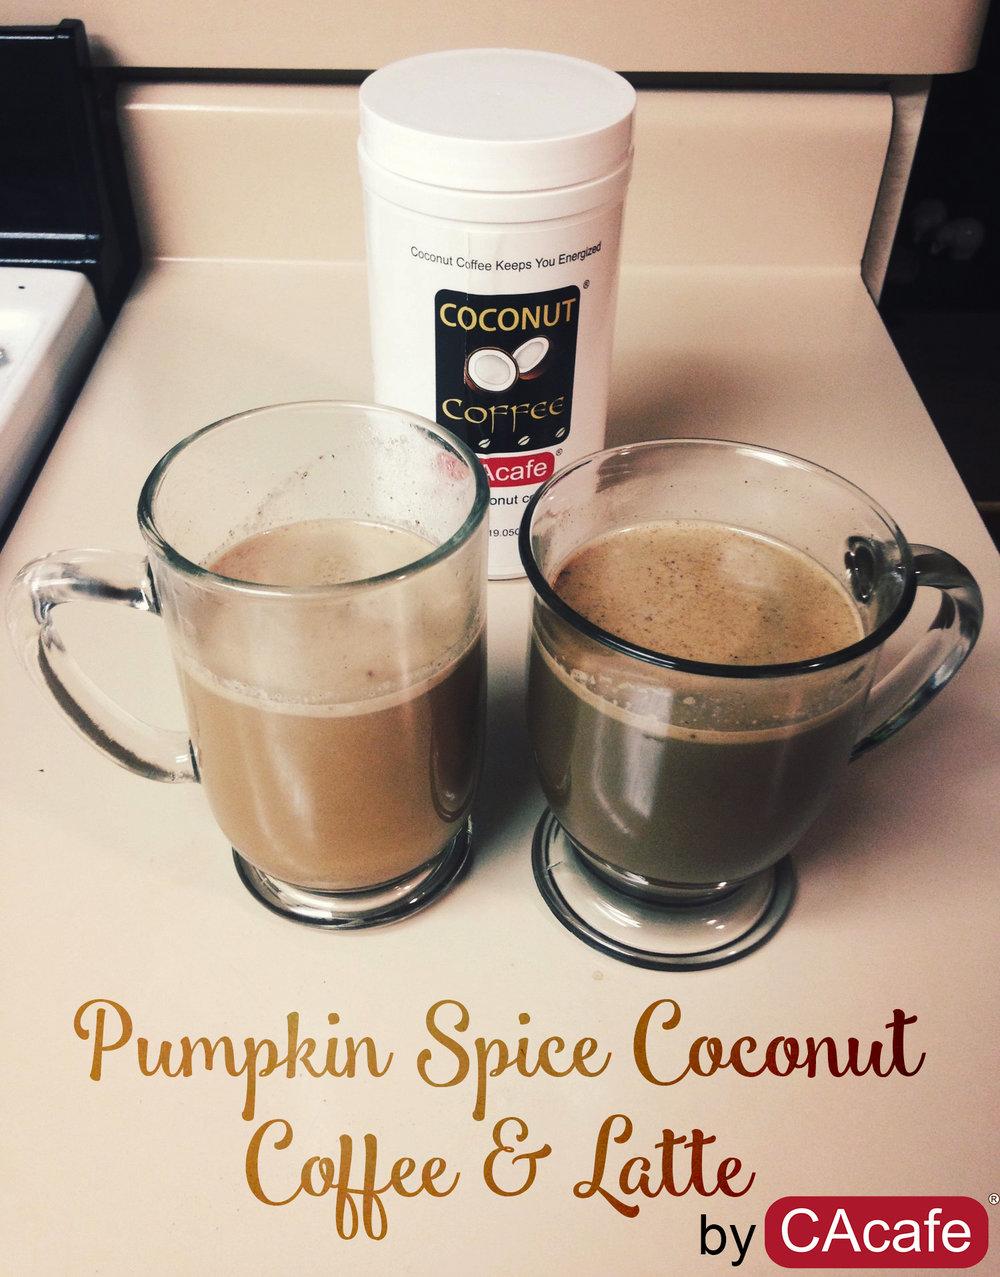 pumpkin spice coconut coffee and latte